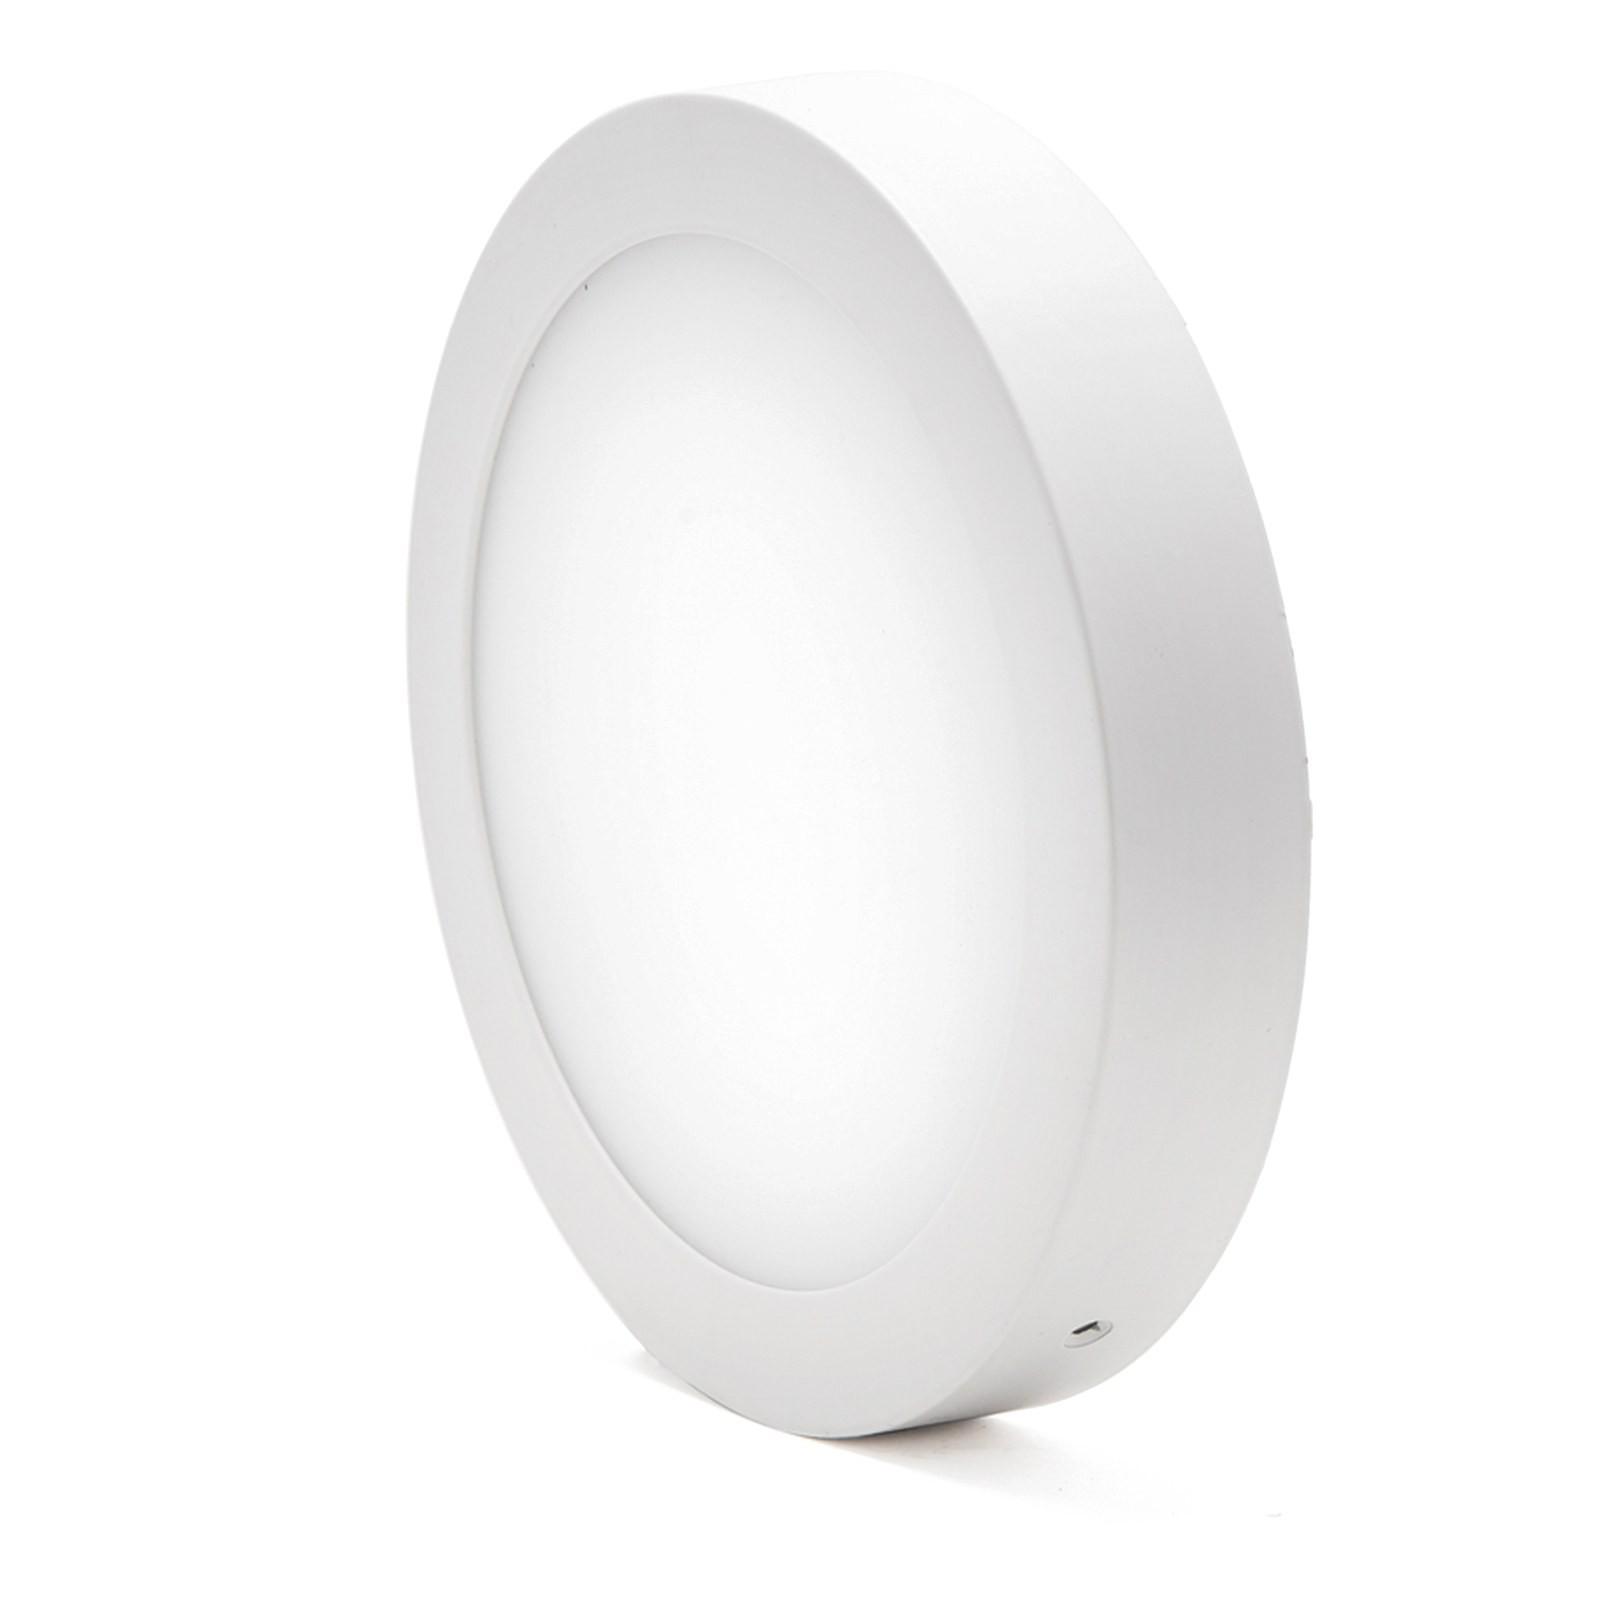 Plafoniera faretto pannello led luce bianca calda 25 watt for Led luce calda